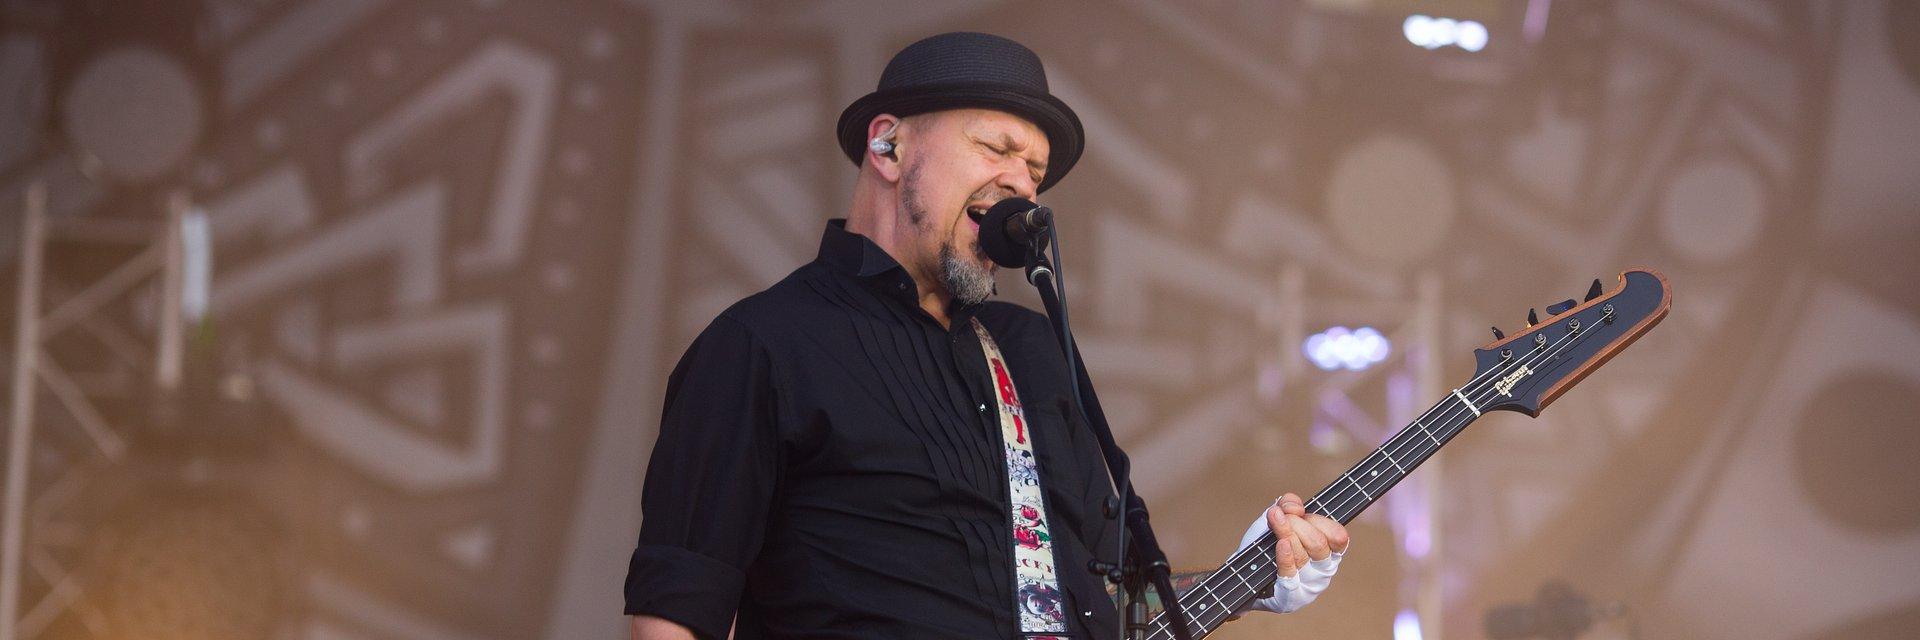 Muzyczne salto mortale na Pol'and'Rock Festival Online